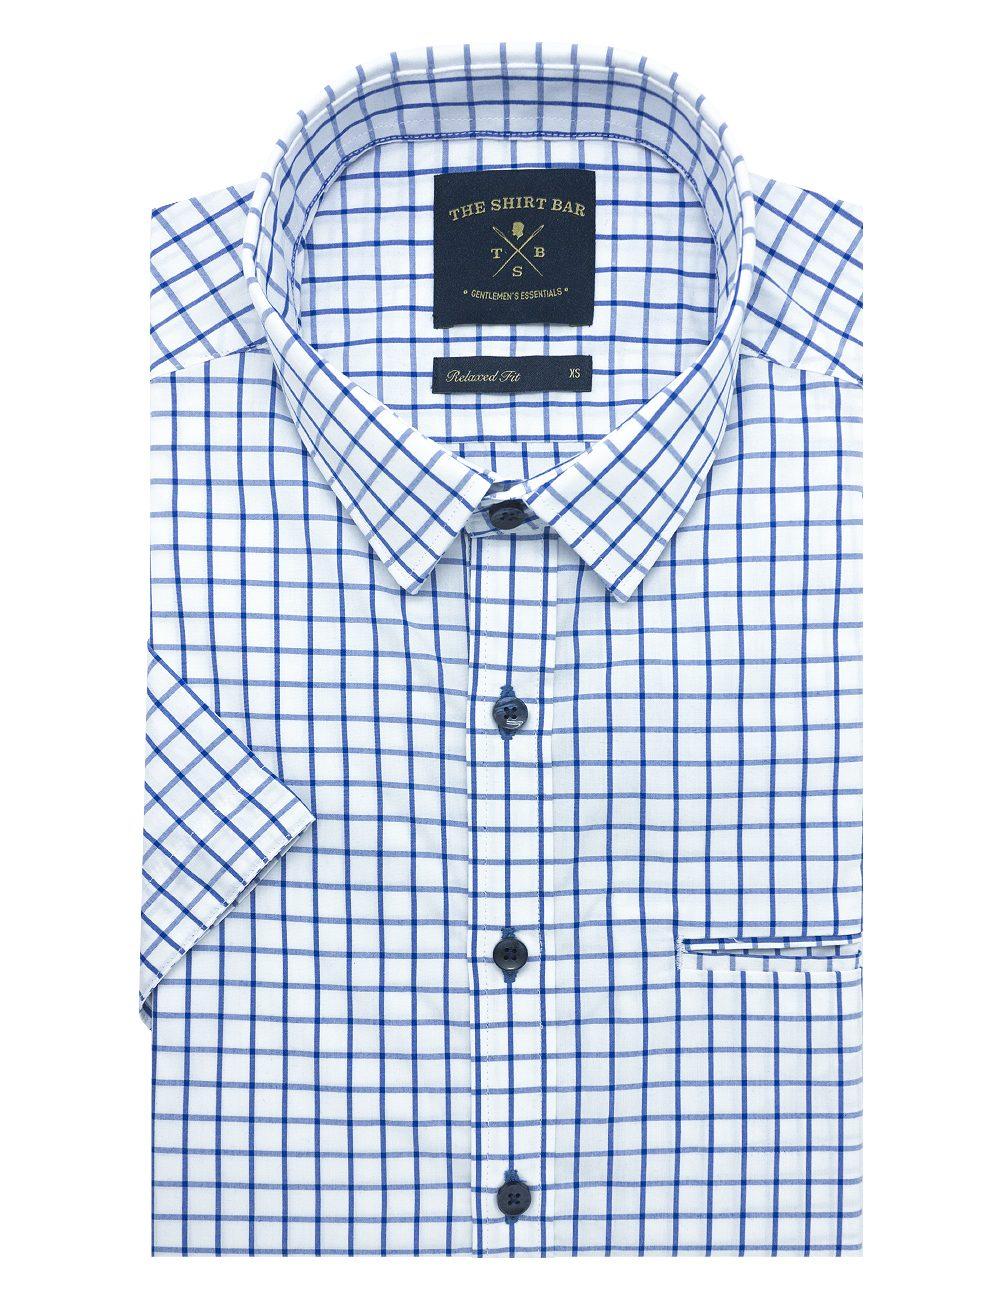 White with Blue Checks Custom / Relaxed Fit Short Sleeve Shirt – RF9SNB16.19